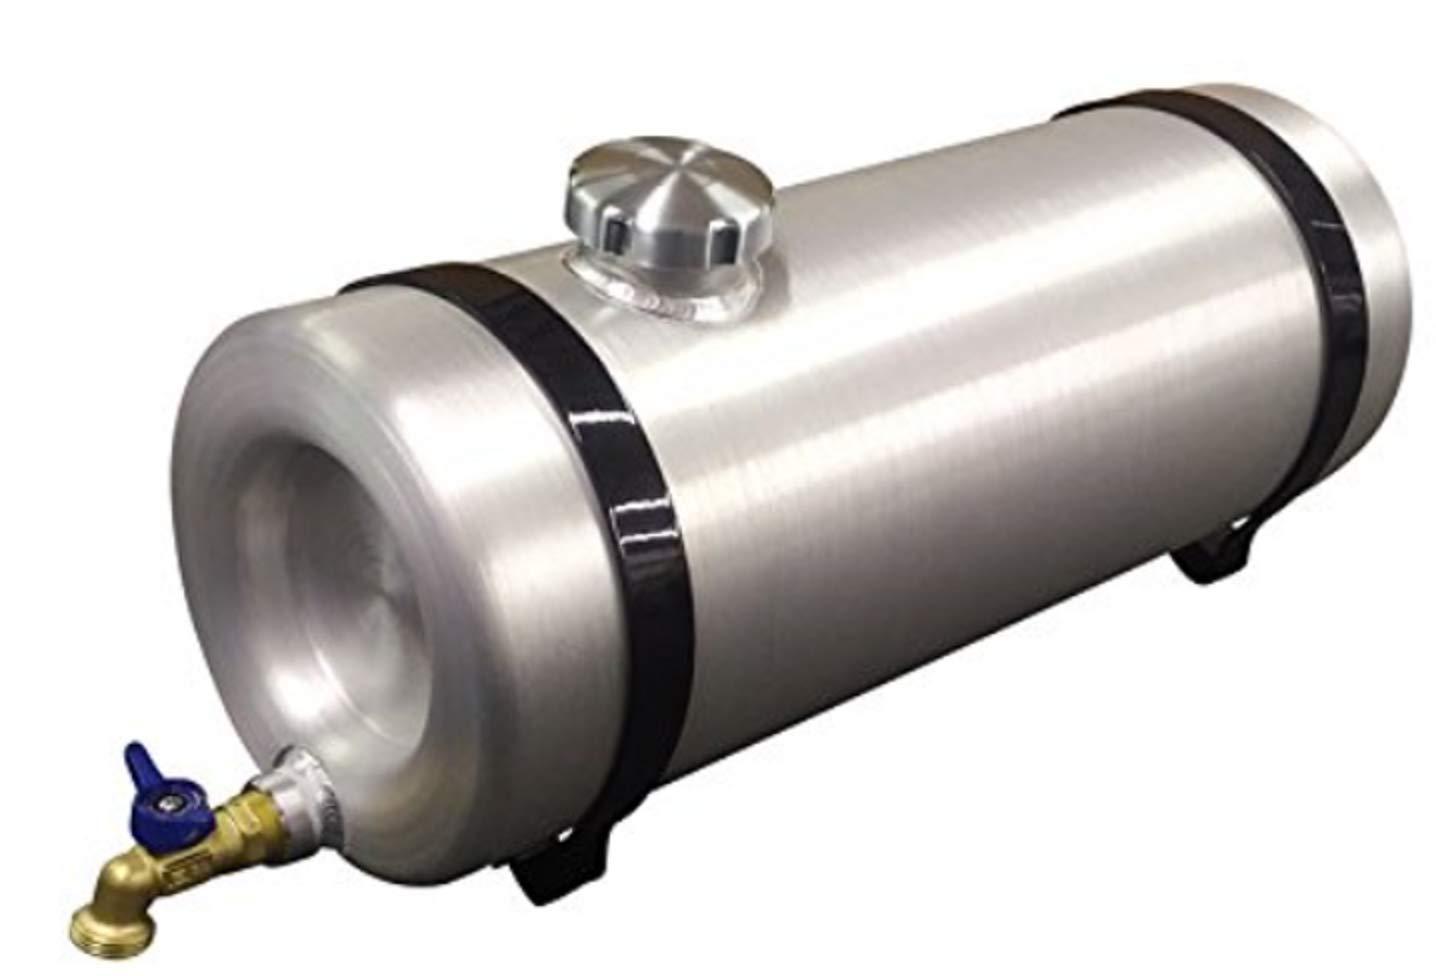 Round Aluminum 5 Gallon Water Storage Tank - Dog Box - Stock Trailer - Camping